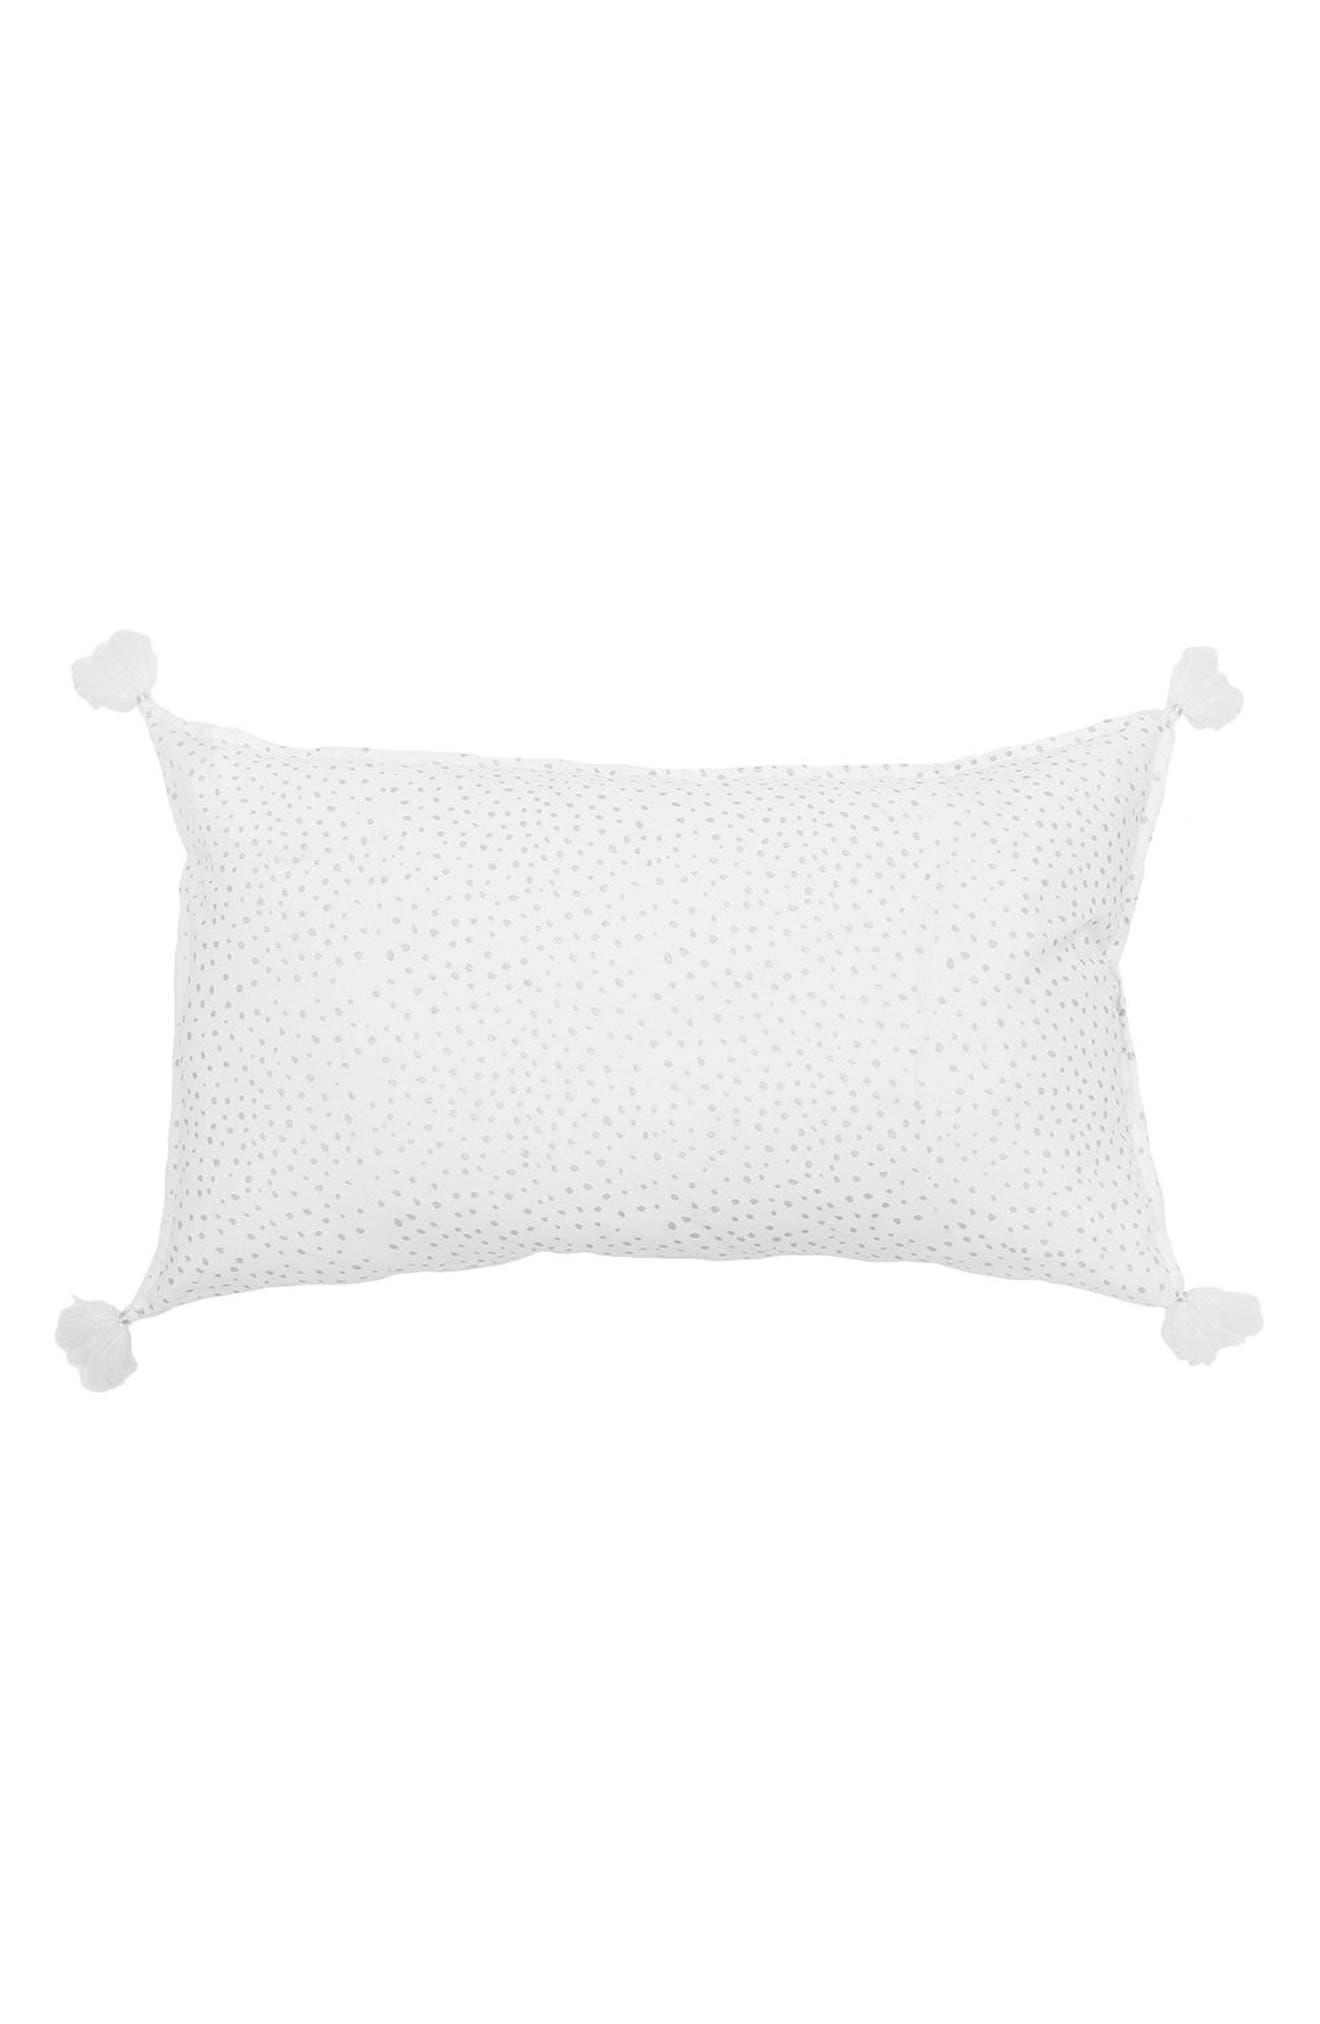 Dot Accent Pillow,                         Main,                         color, Silver